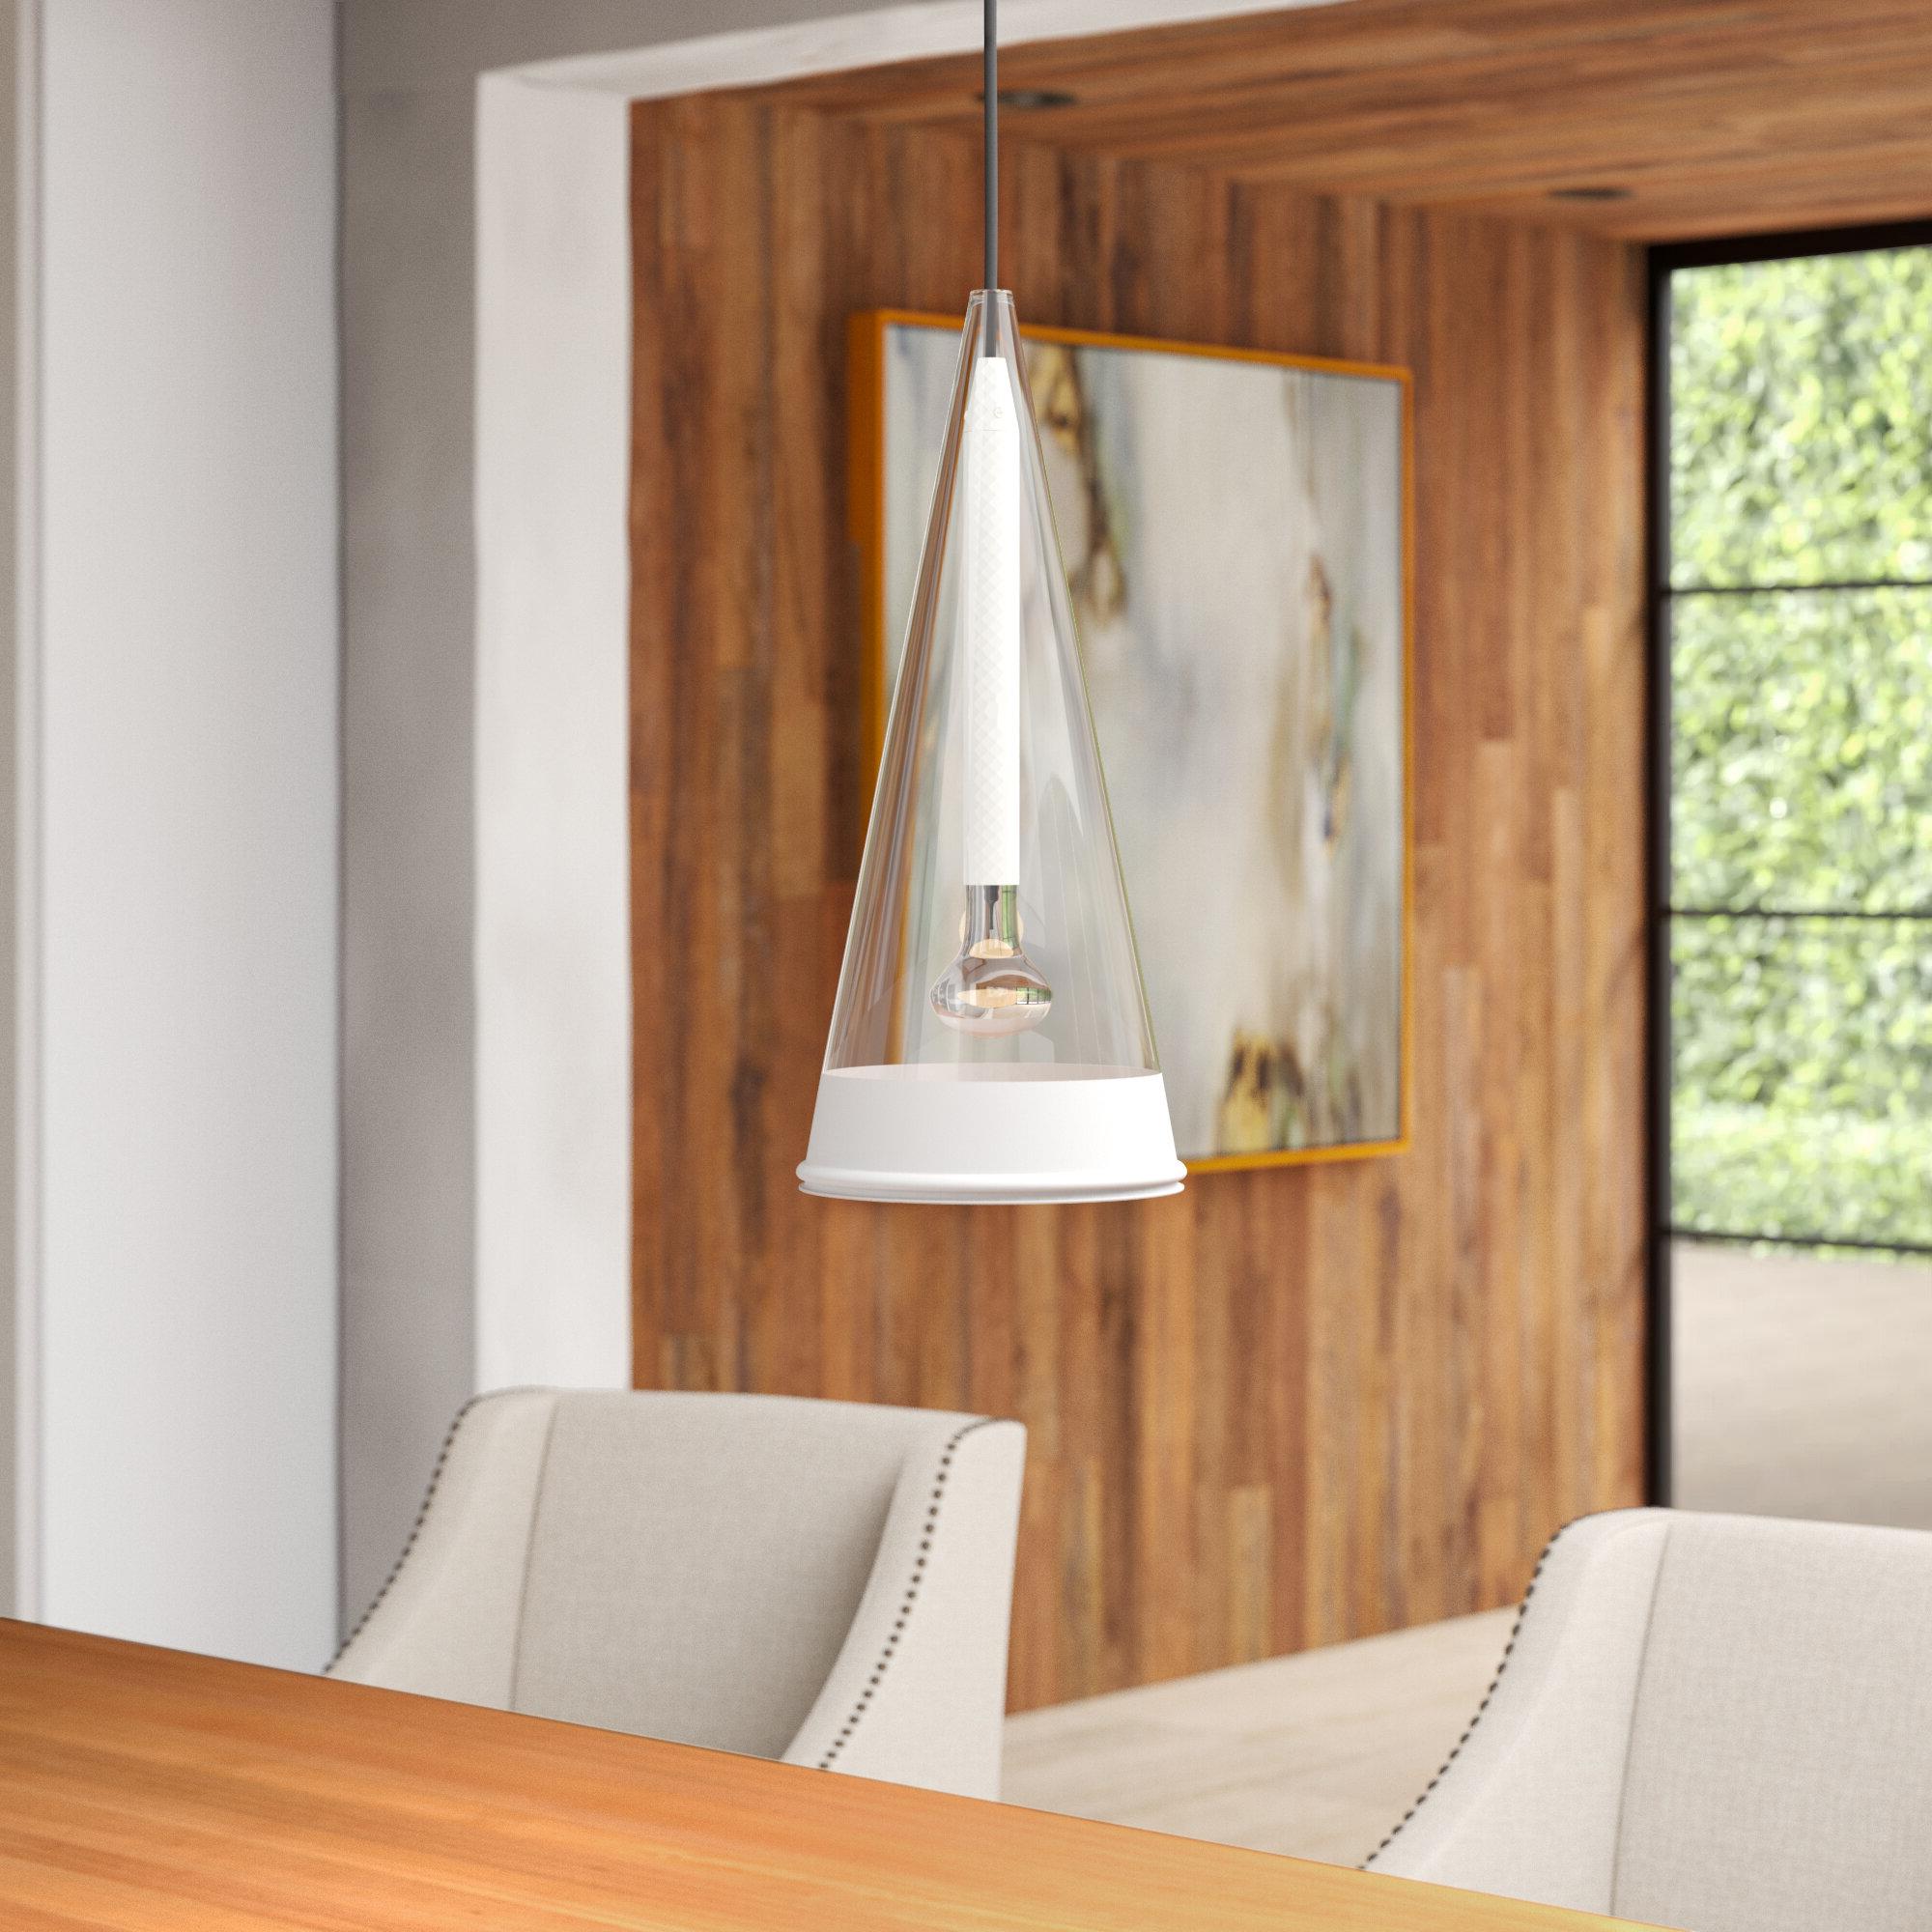 Guro 1 Light Cone Pendants Throughout Favorite Fucsia 1 Light Cone Pendant (View 8 of 20)